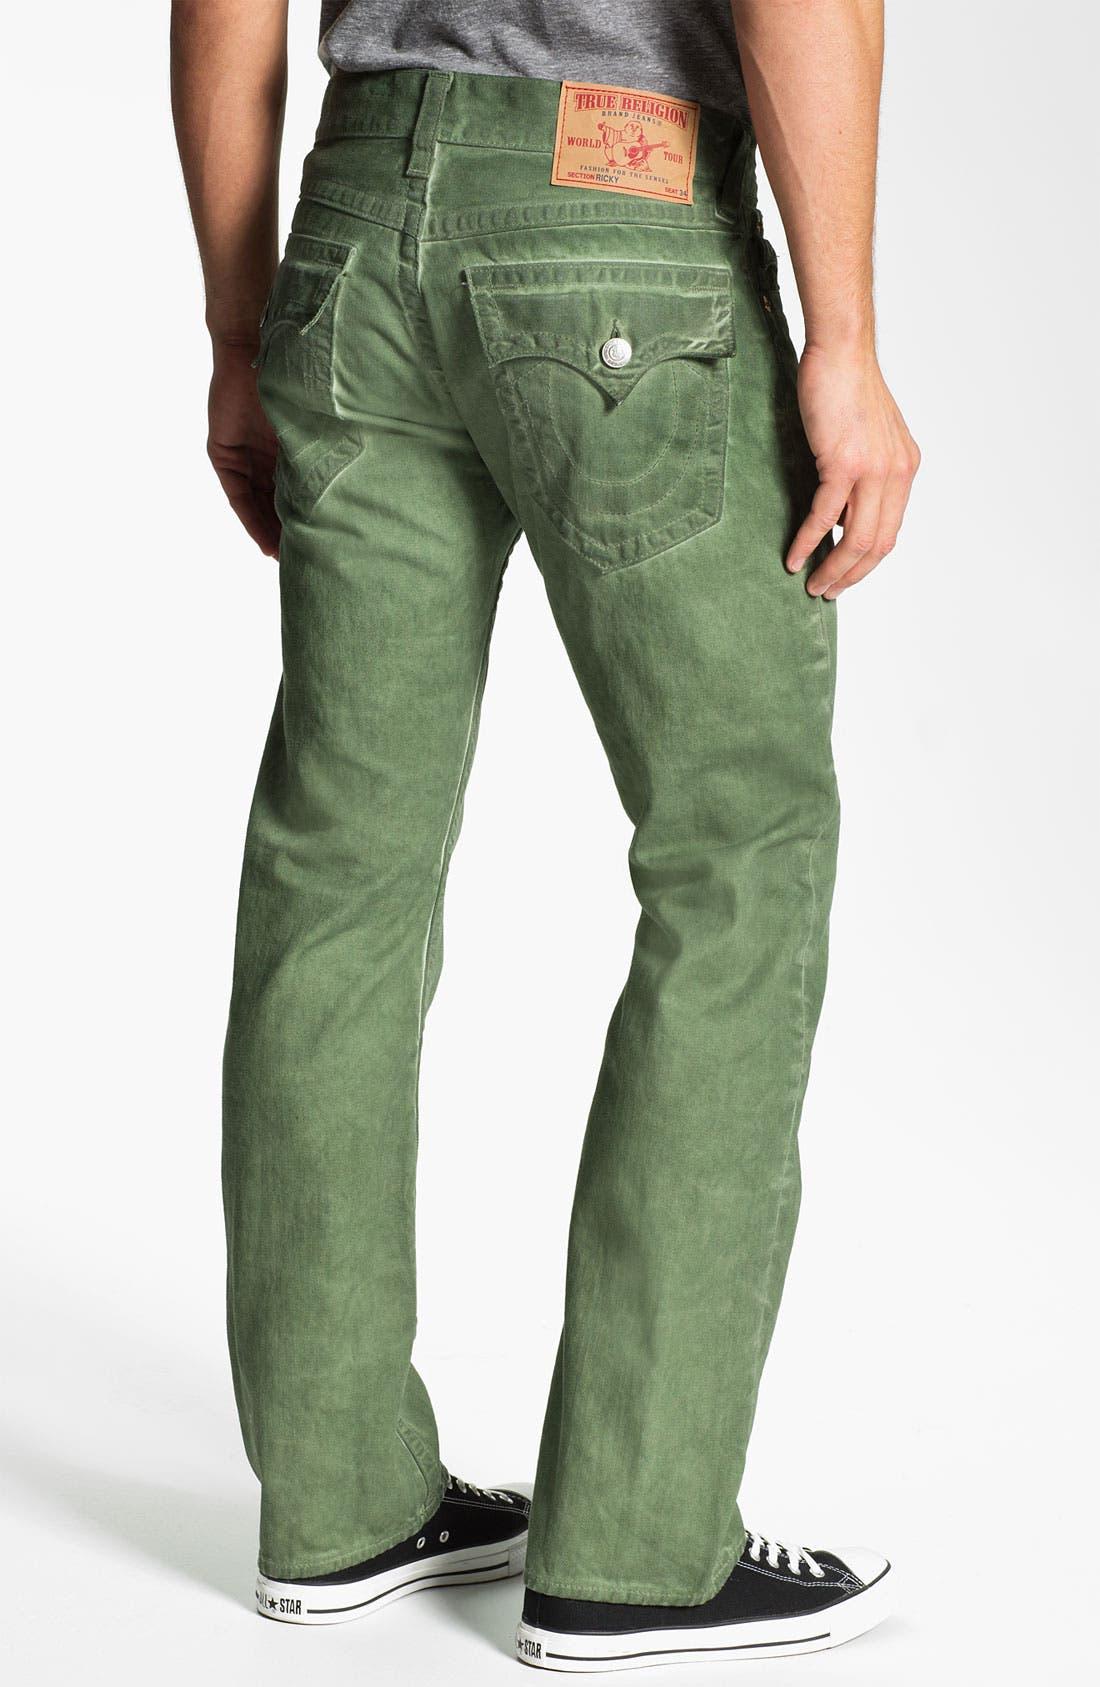 Main Image - True Religion Brand Jeans 'Ricky' Straight Leg Jeans (Mustard Yellow)